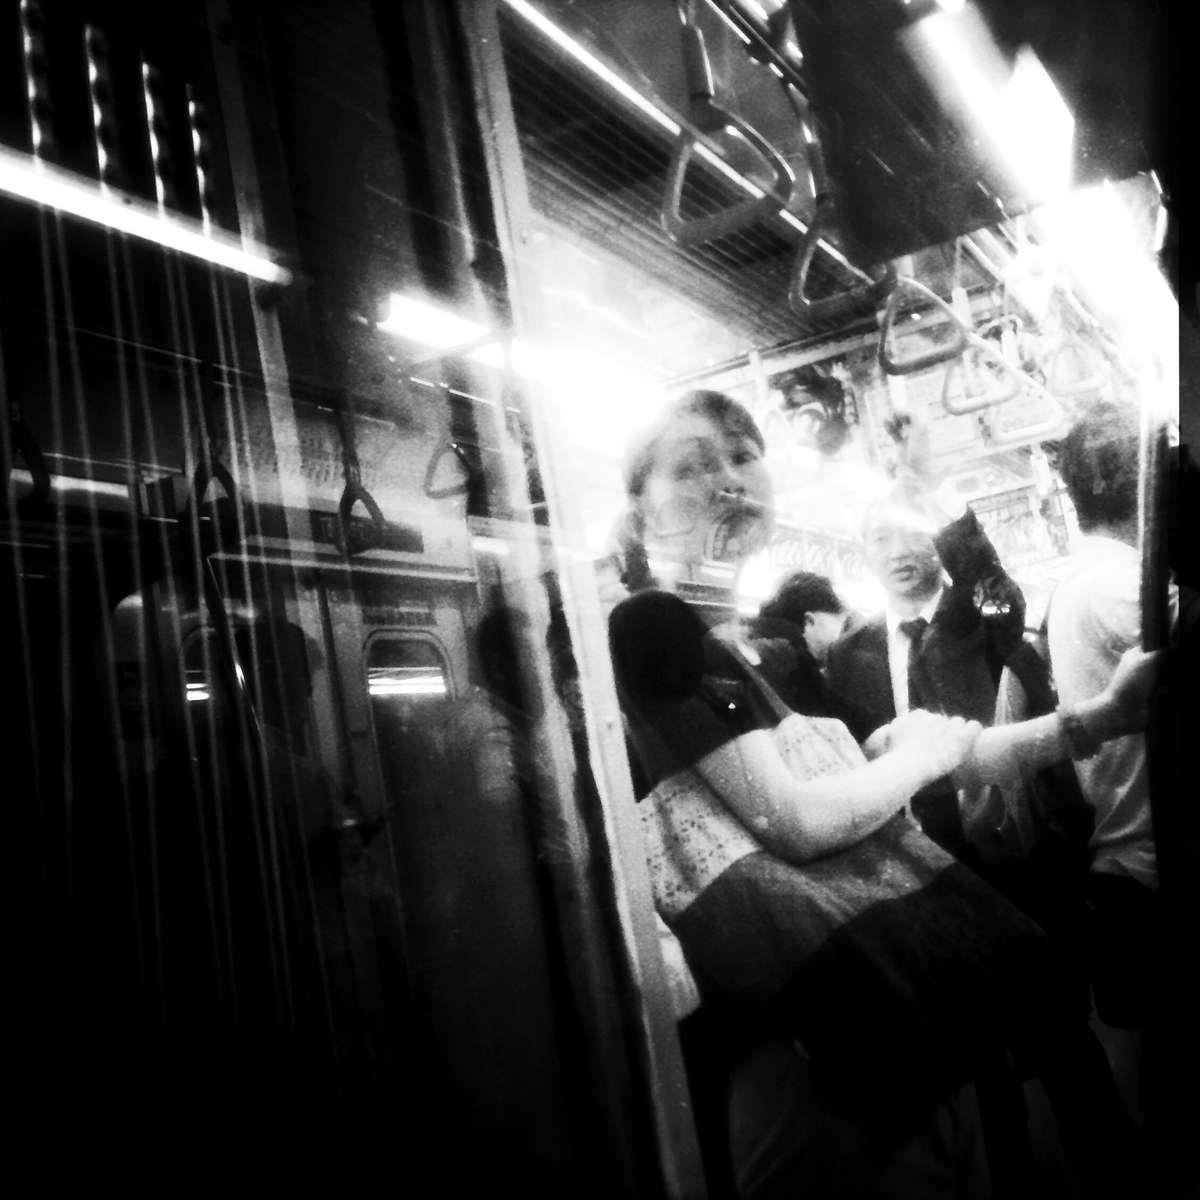 Tokyo ennui: Woman at the metro.